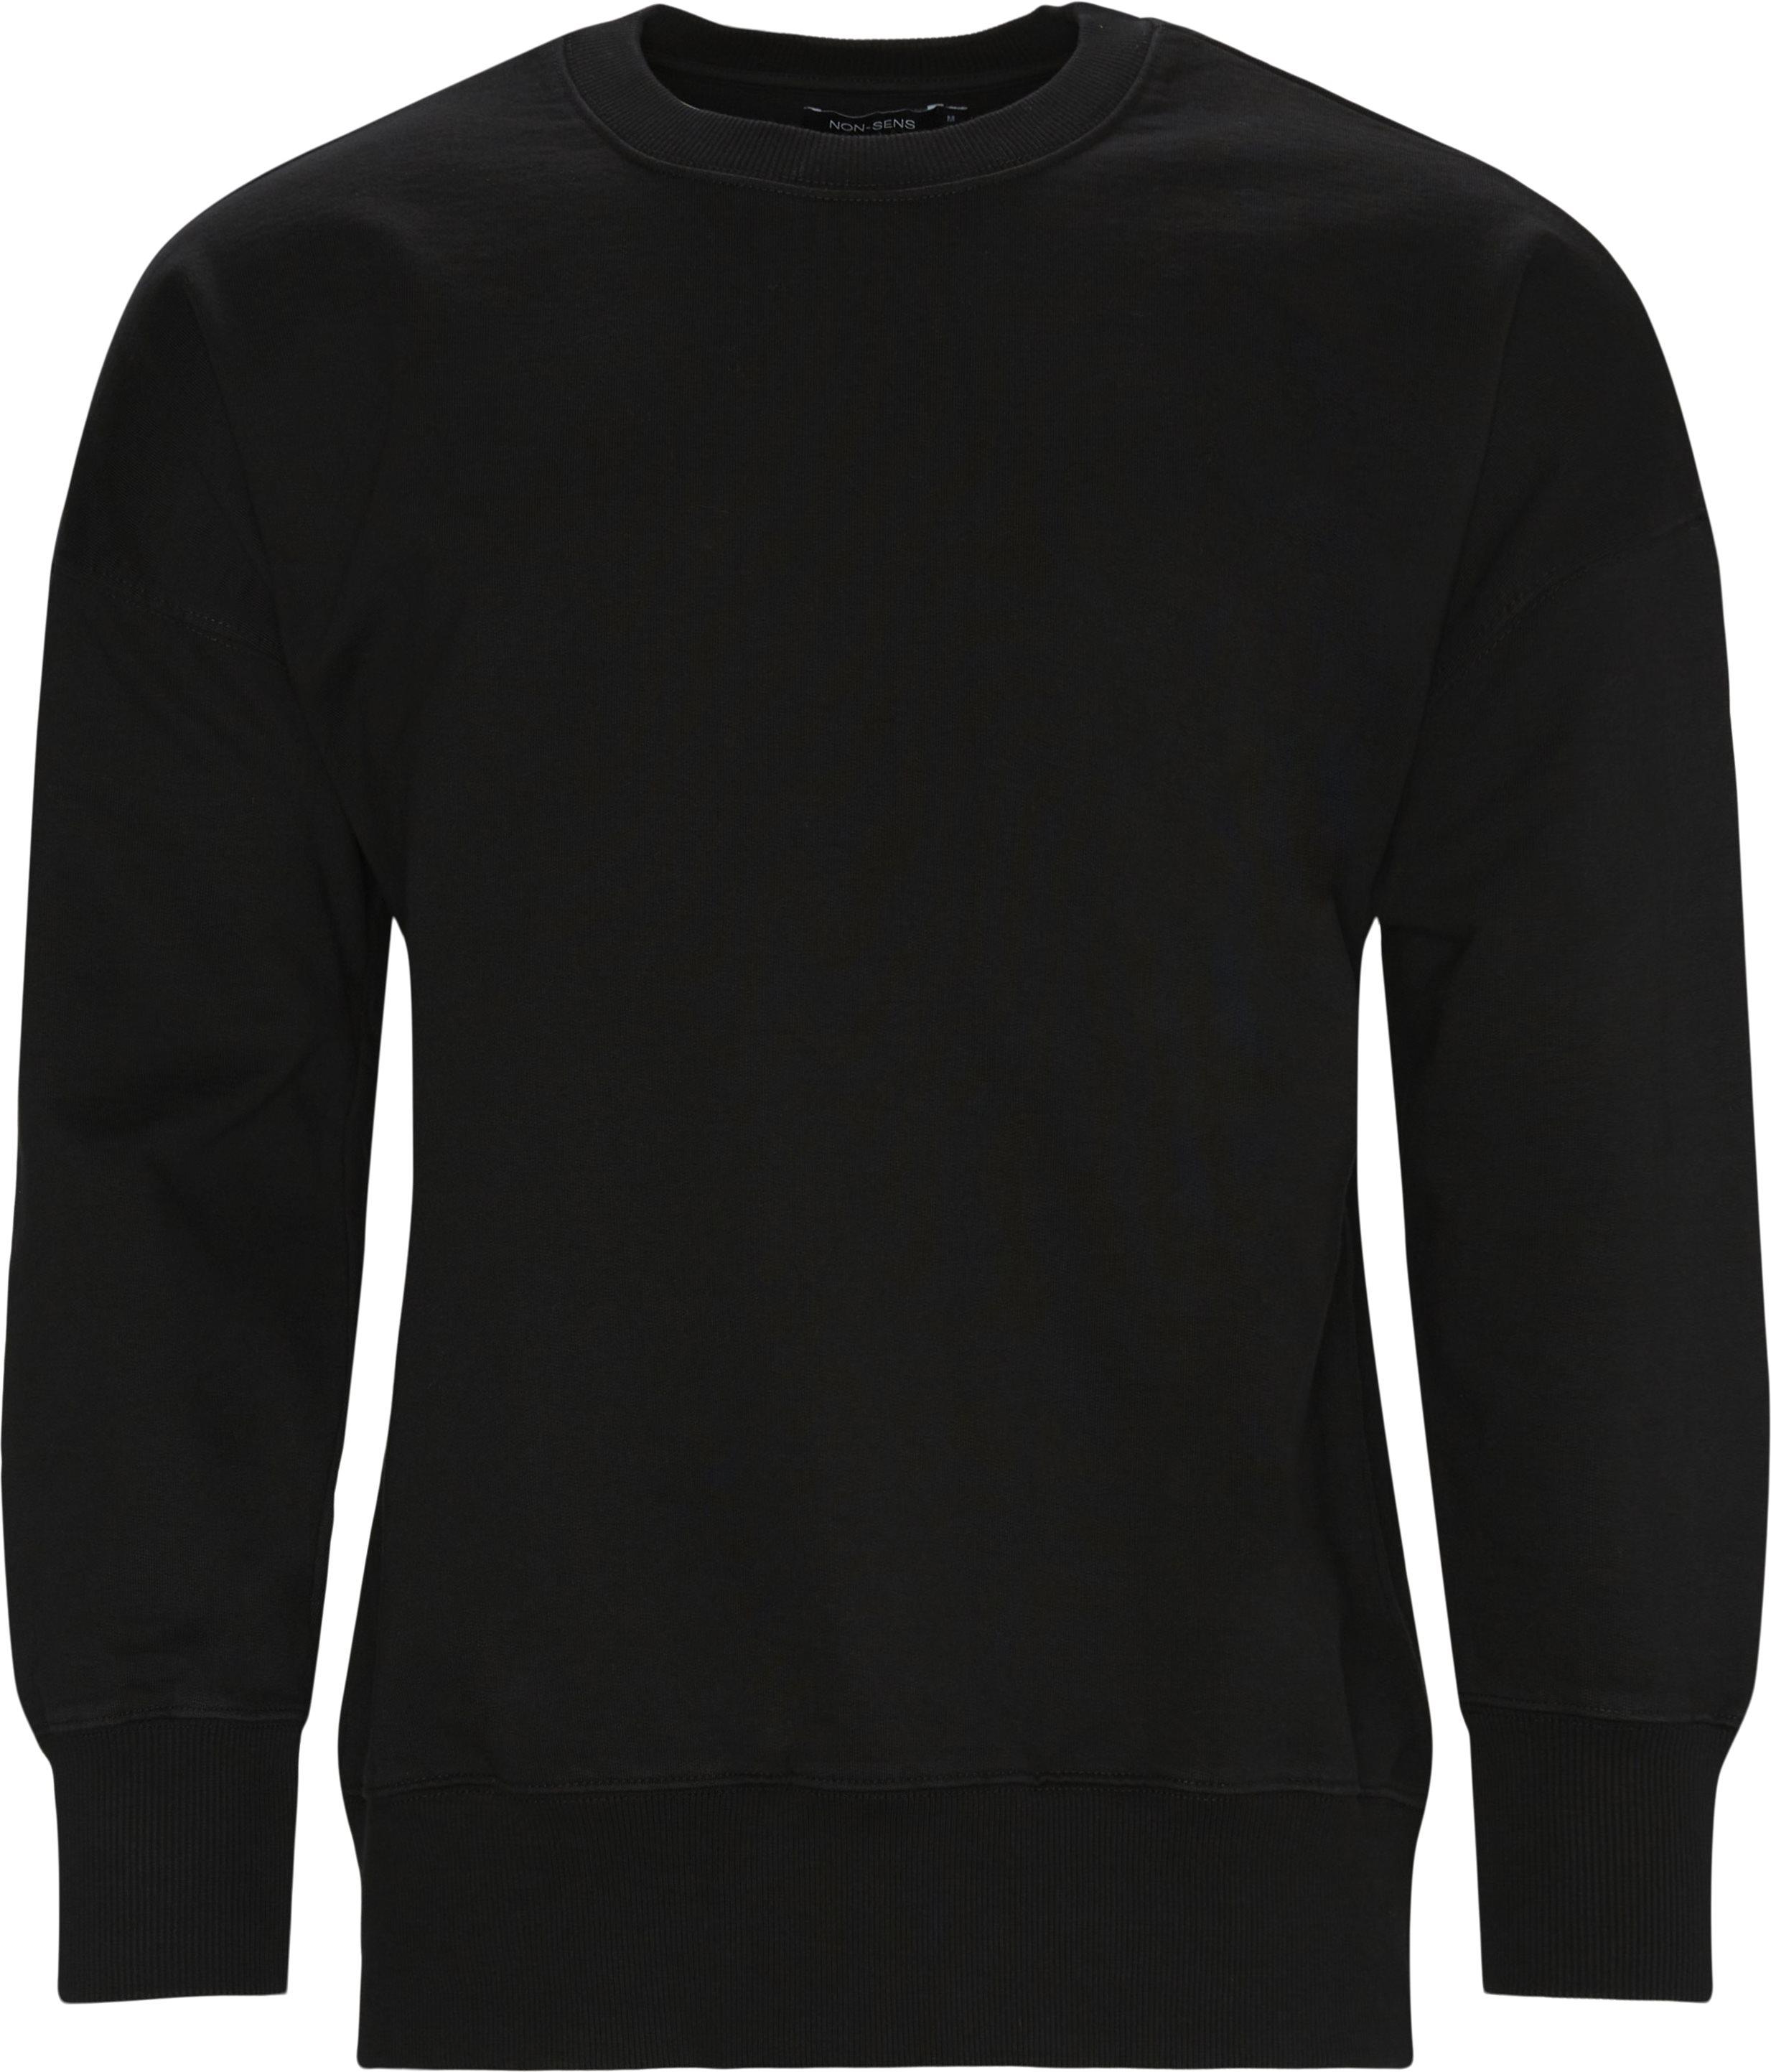 Caruso Crewneck Sweatshirt - Sweatshirts - Regular - Sort